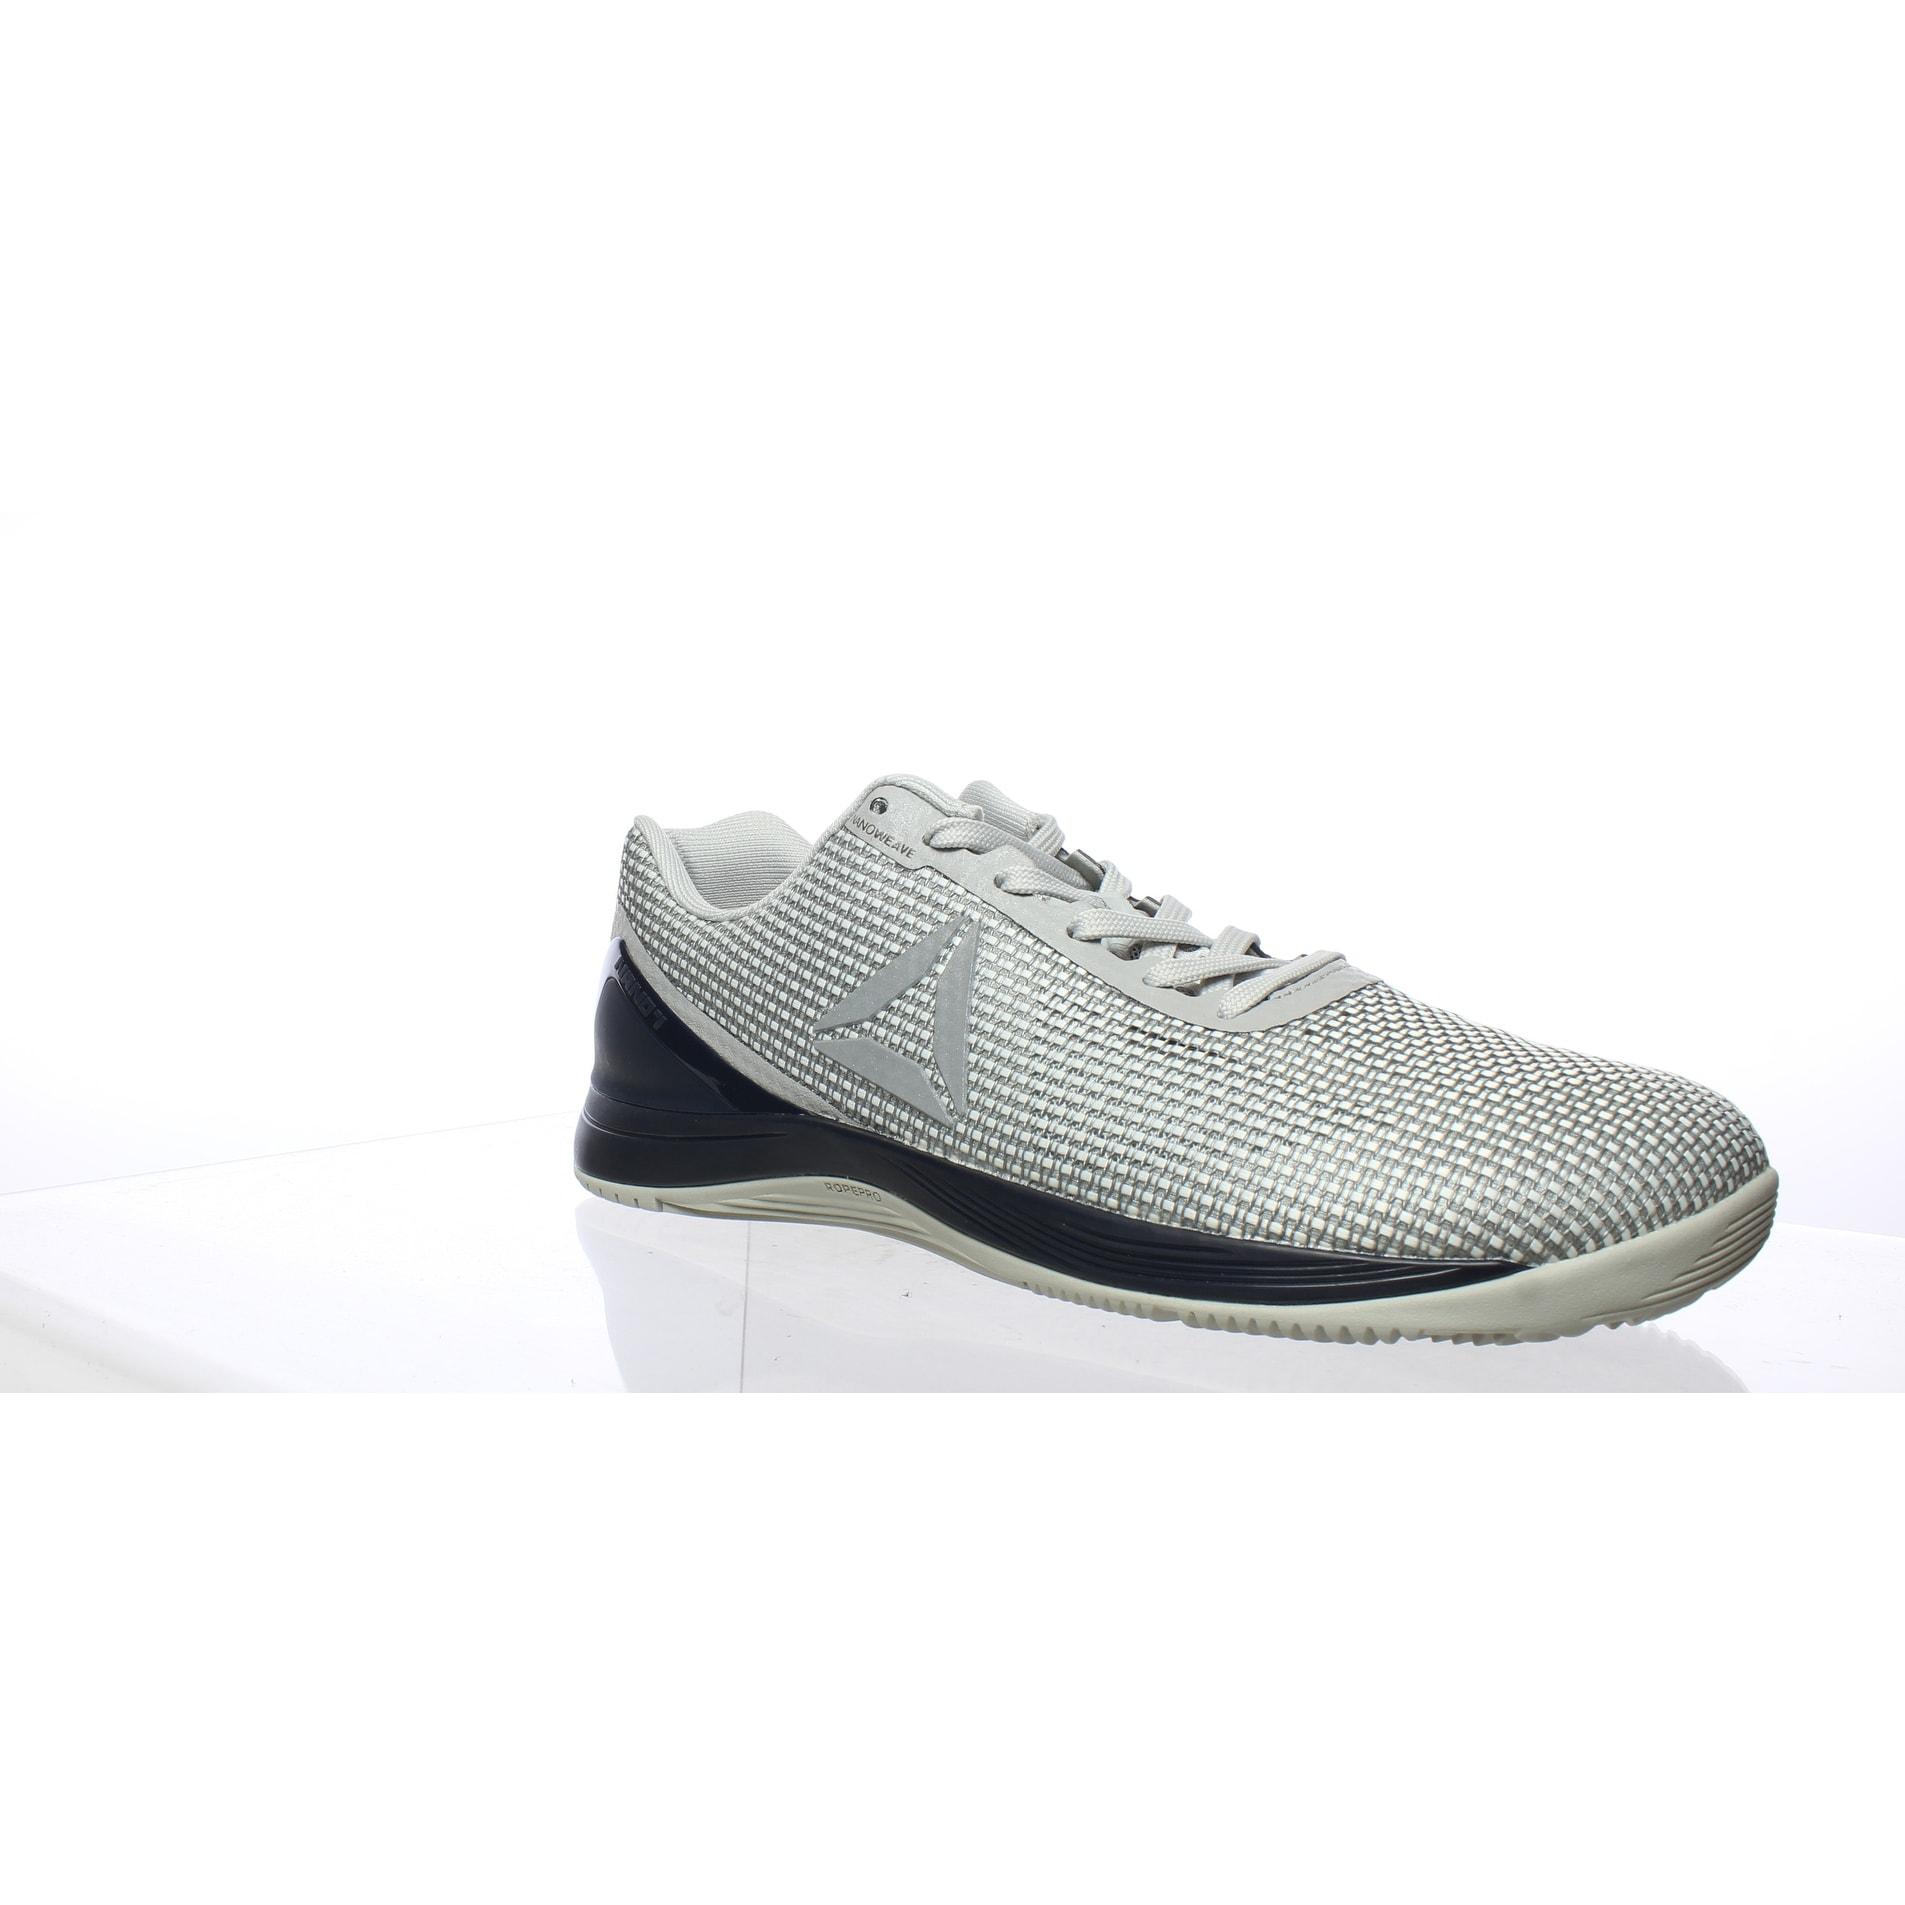 Reebok Mens Crossfit Nano 7.0 Gray Cross Training Shoes Size 10